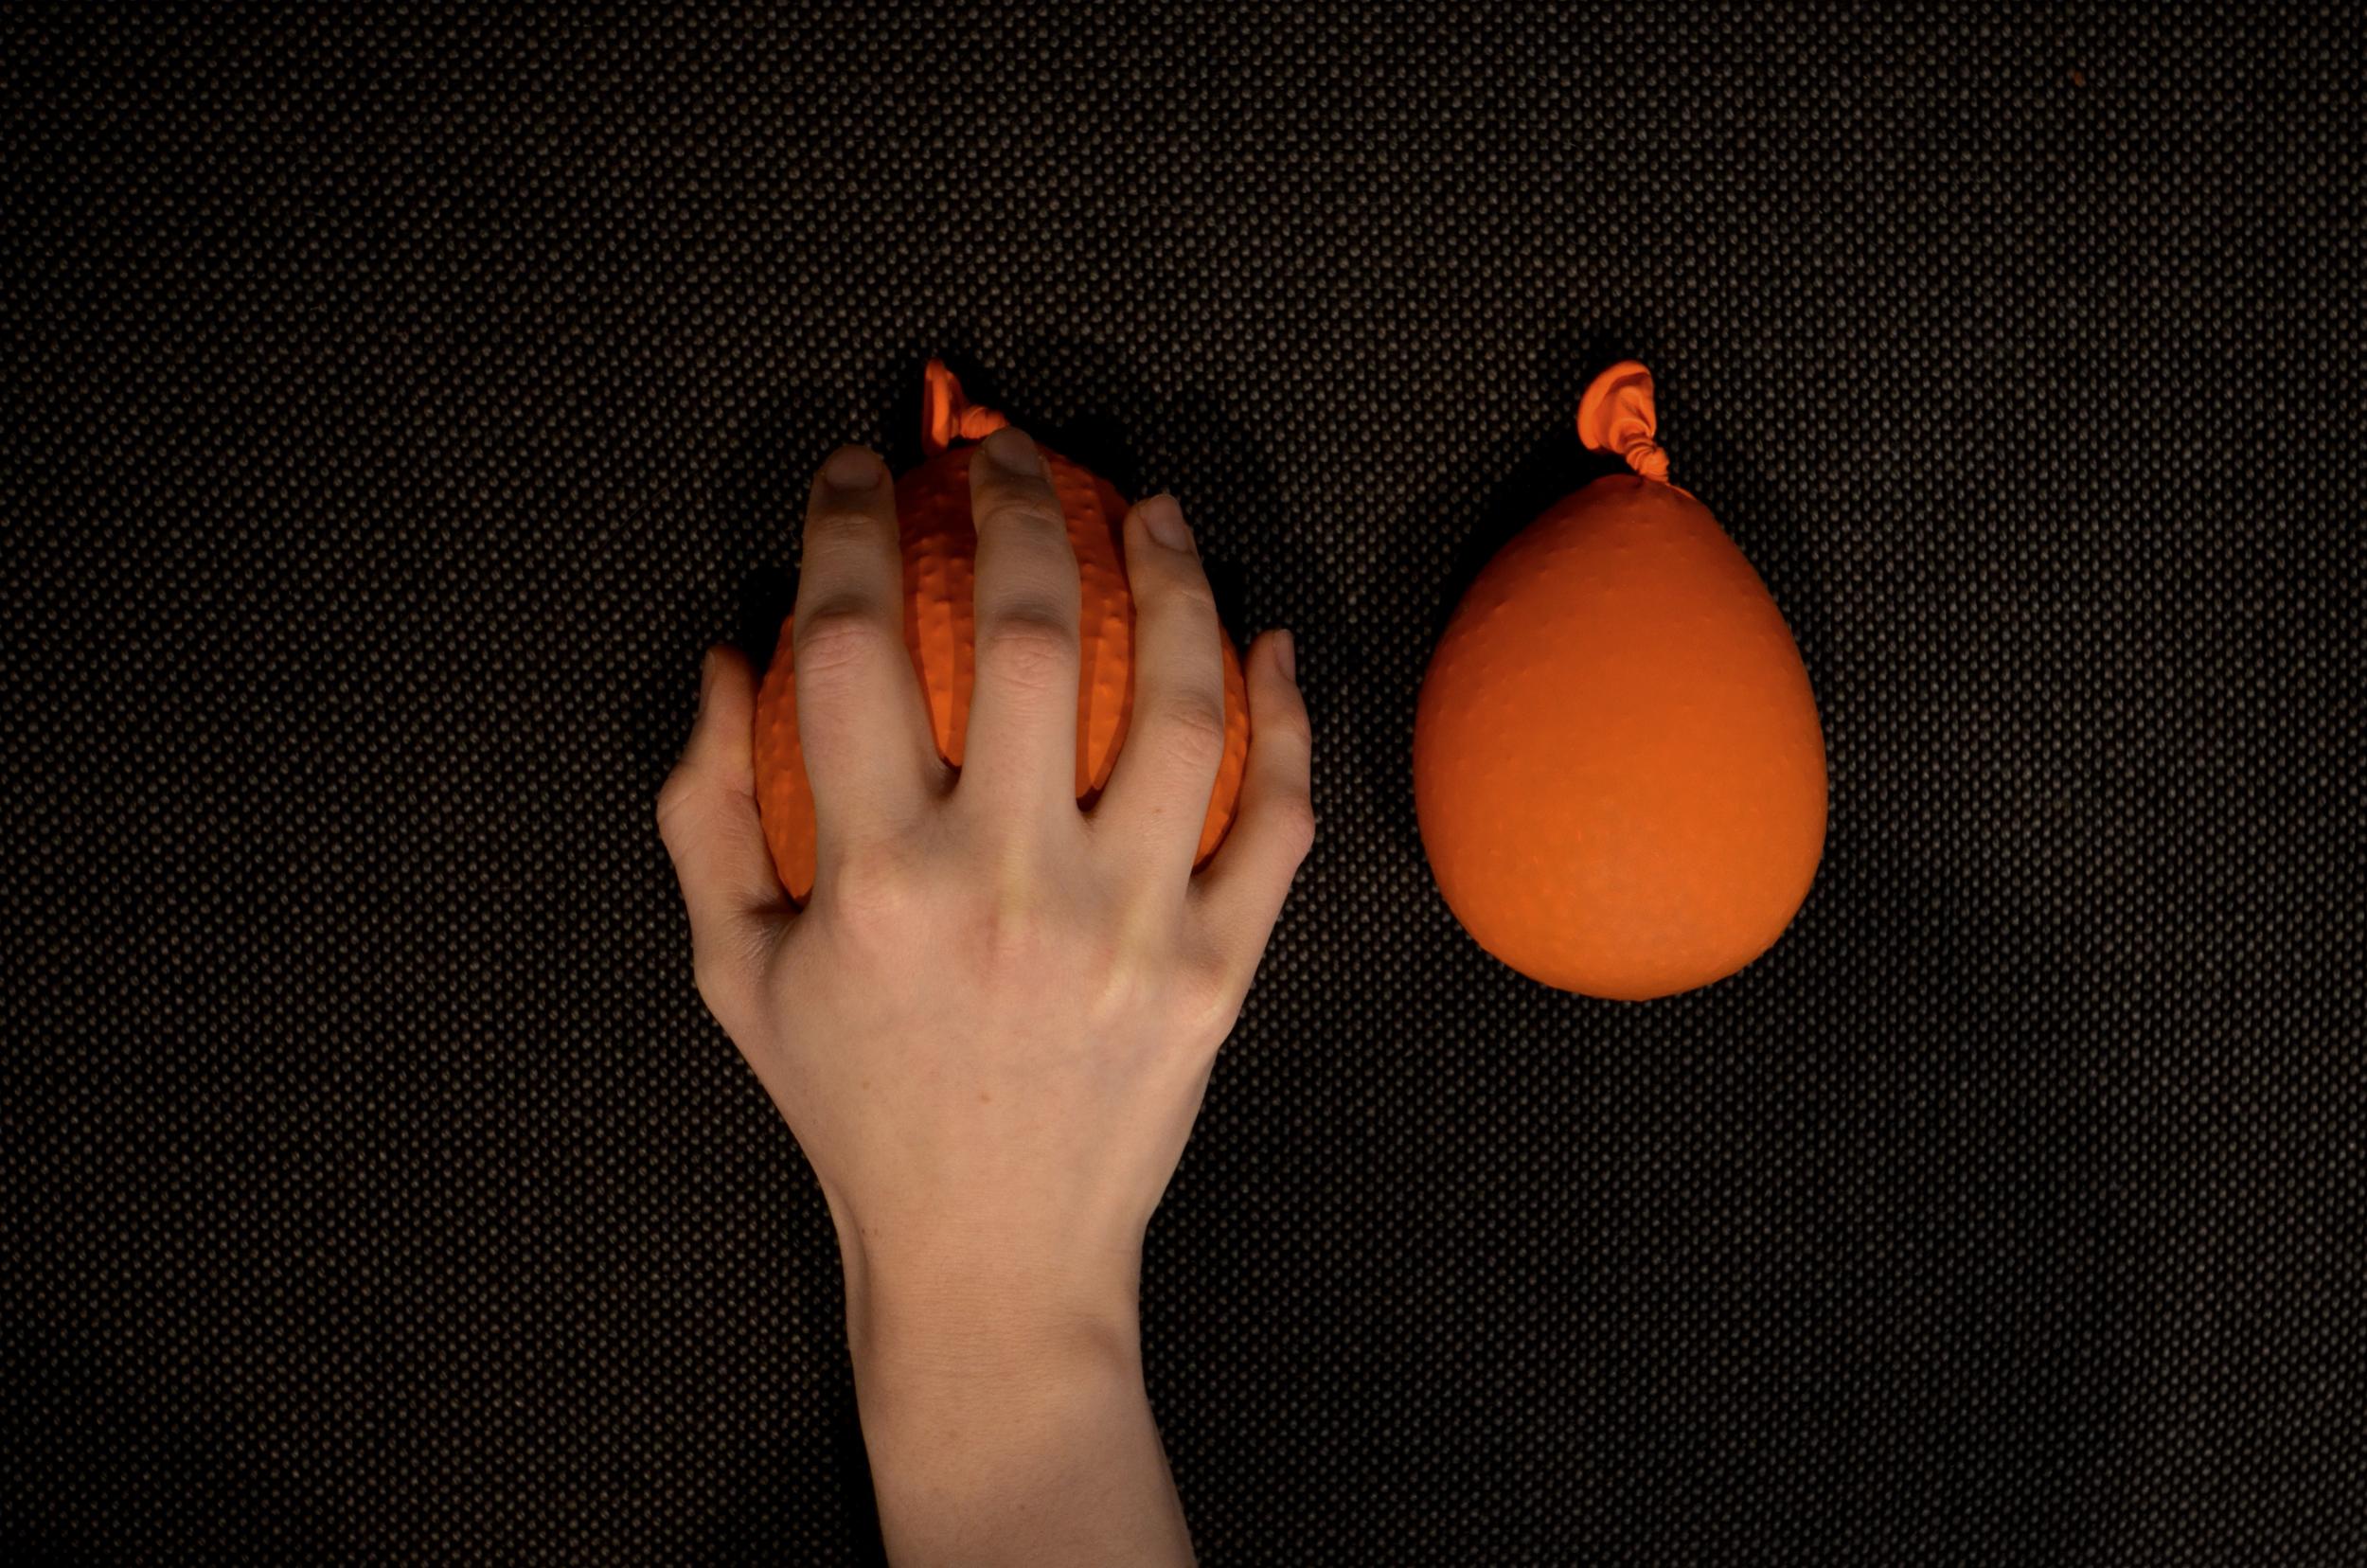 hand_baloons.JPG